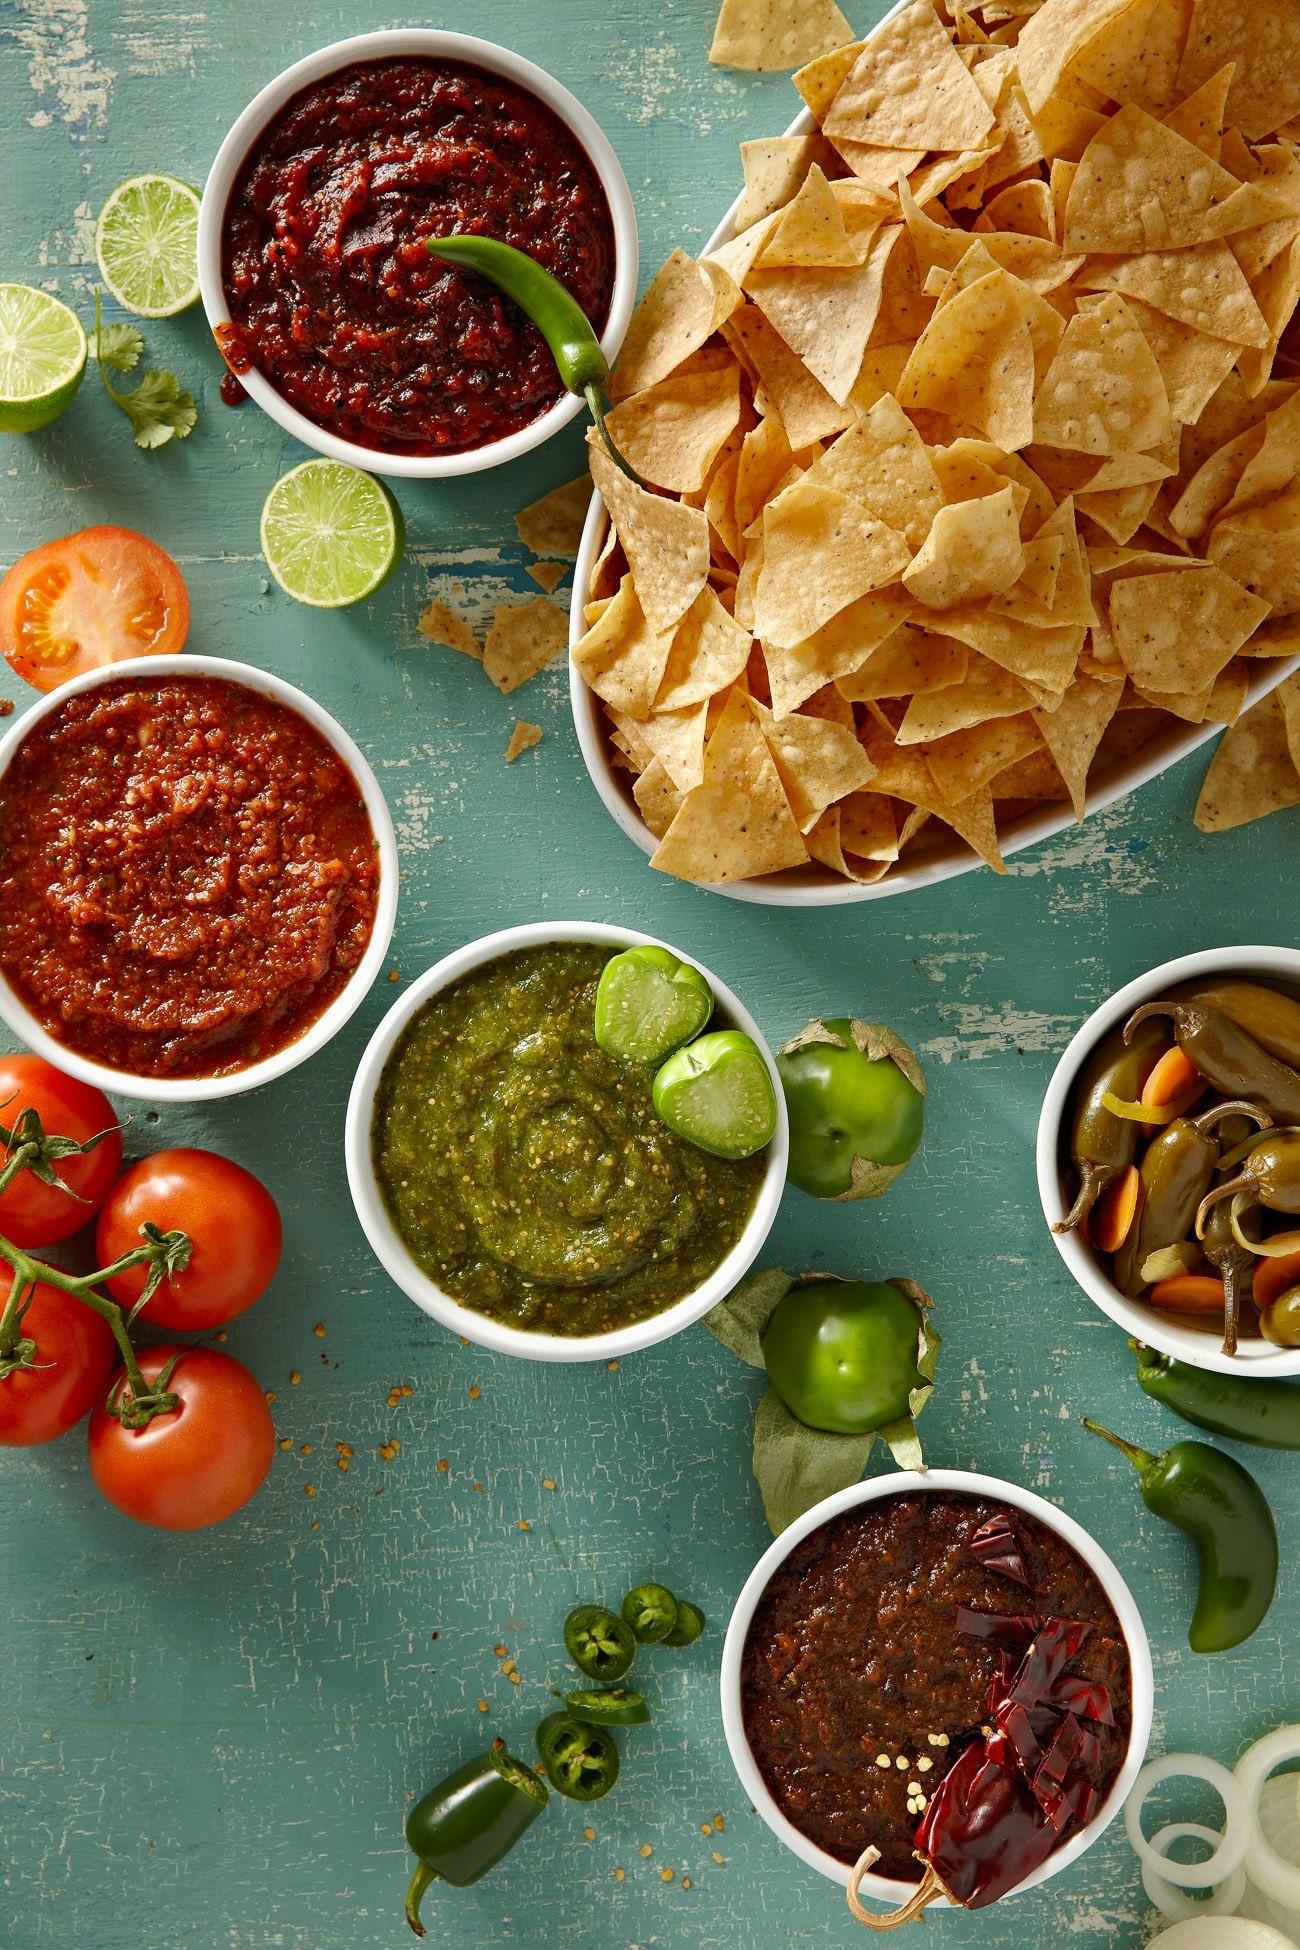 The recipe of Rubio's guacamole is quite simple